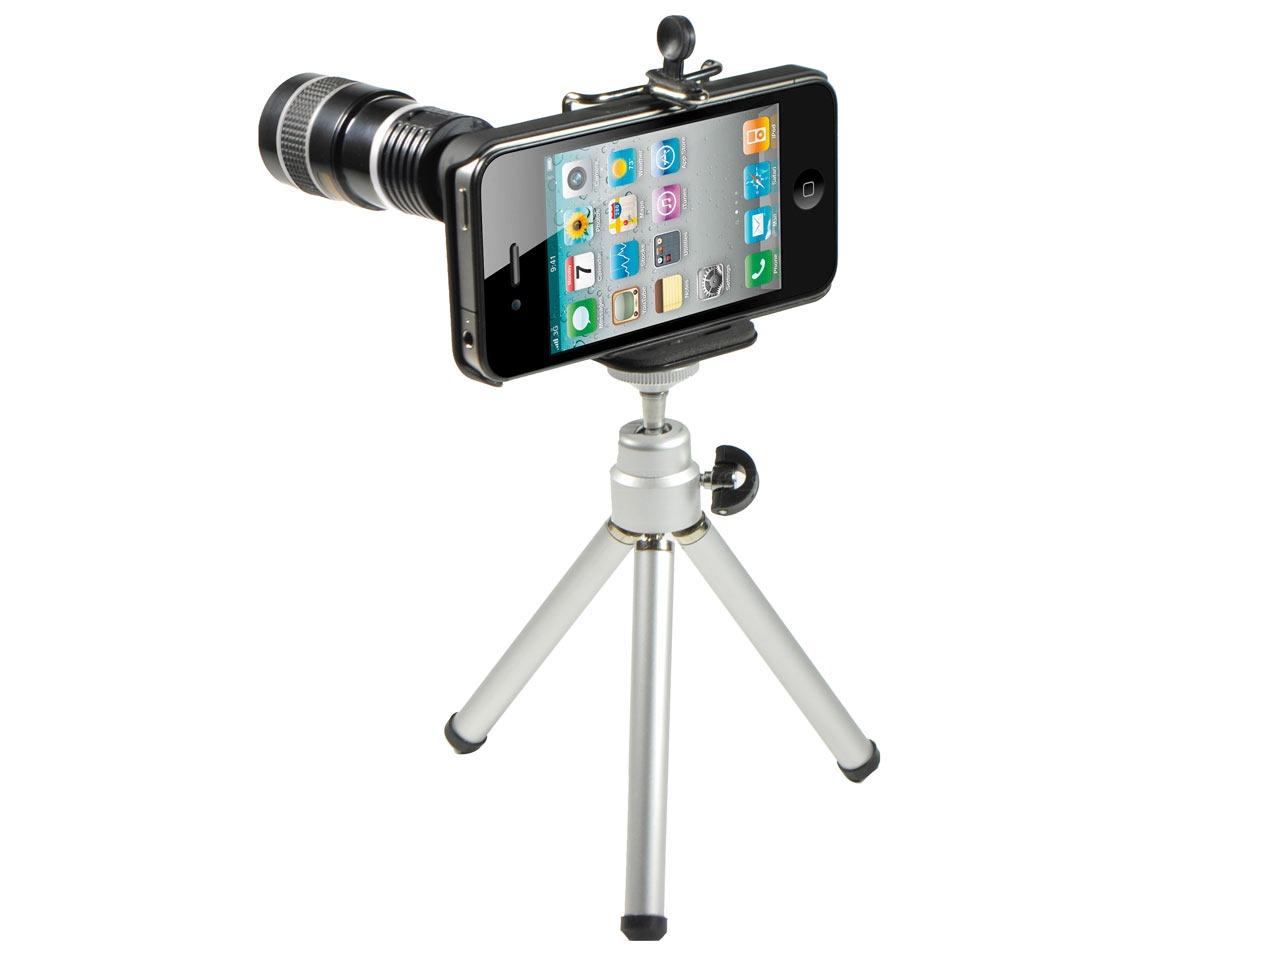 iPhone 4, Rollei 8x teleobjektiv, un teleobjetivo para una cámara deficiente